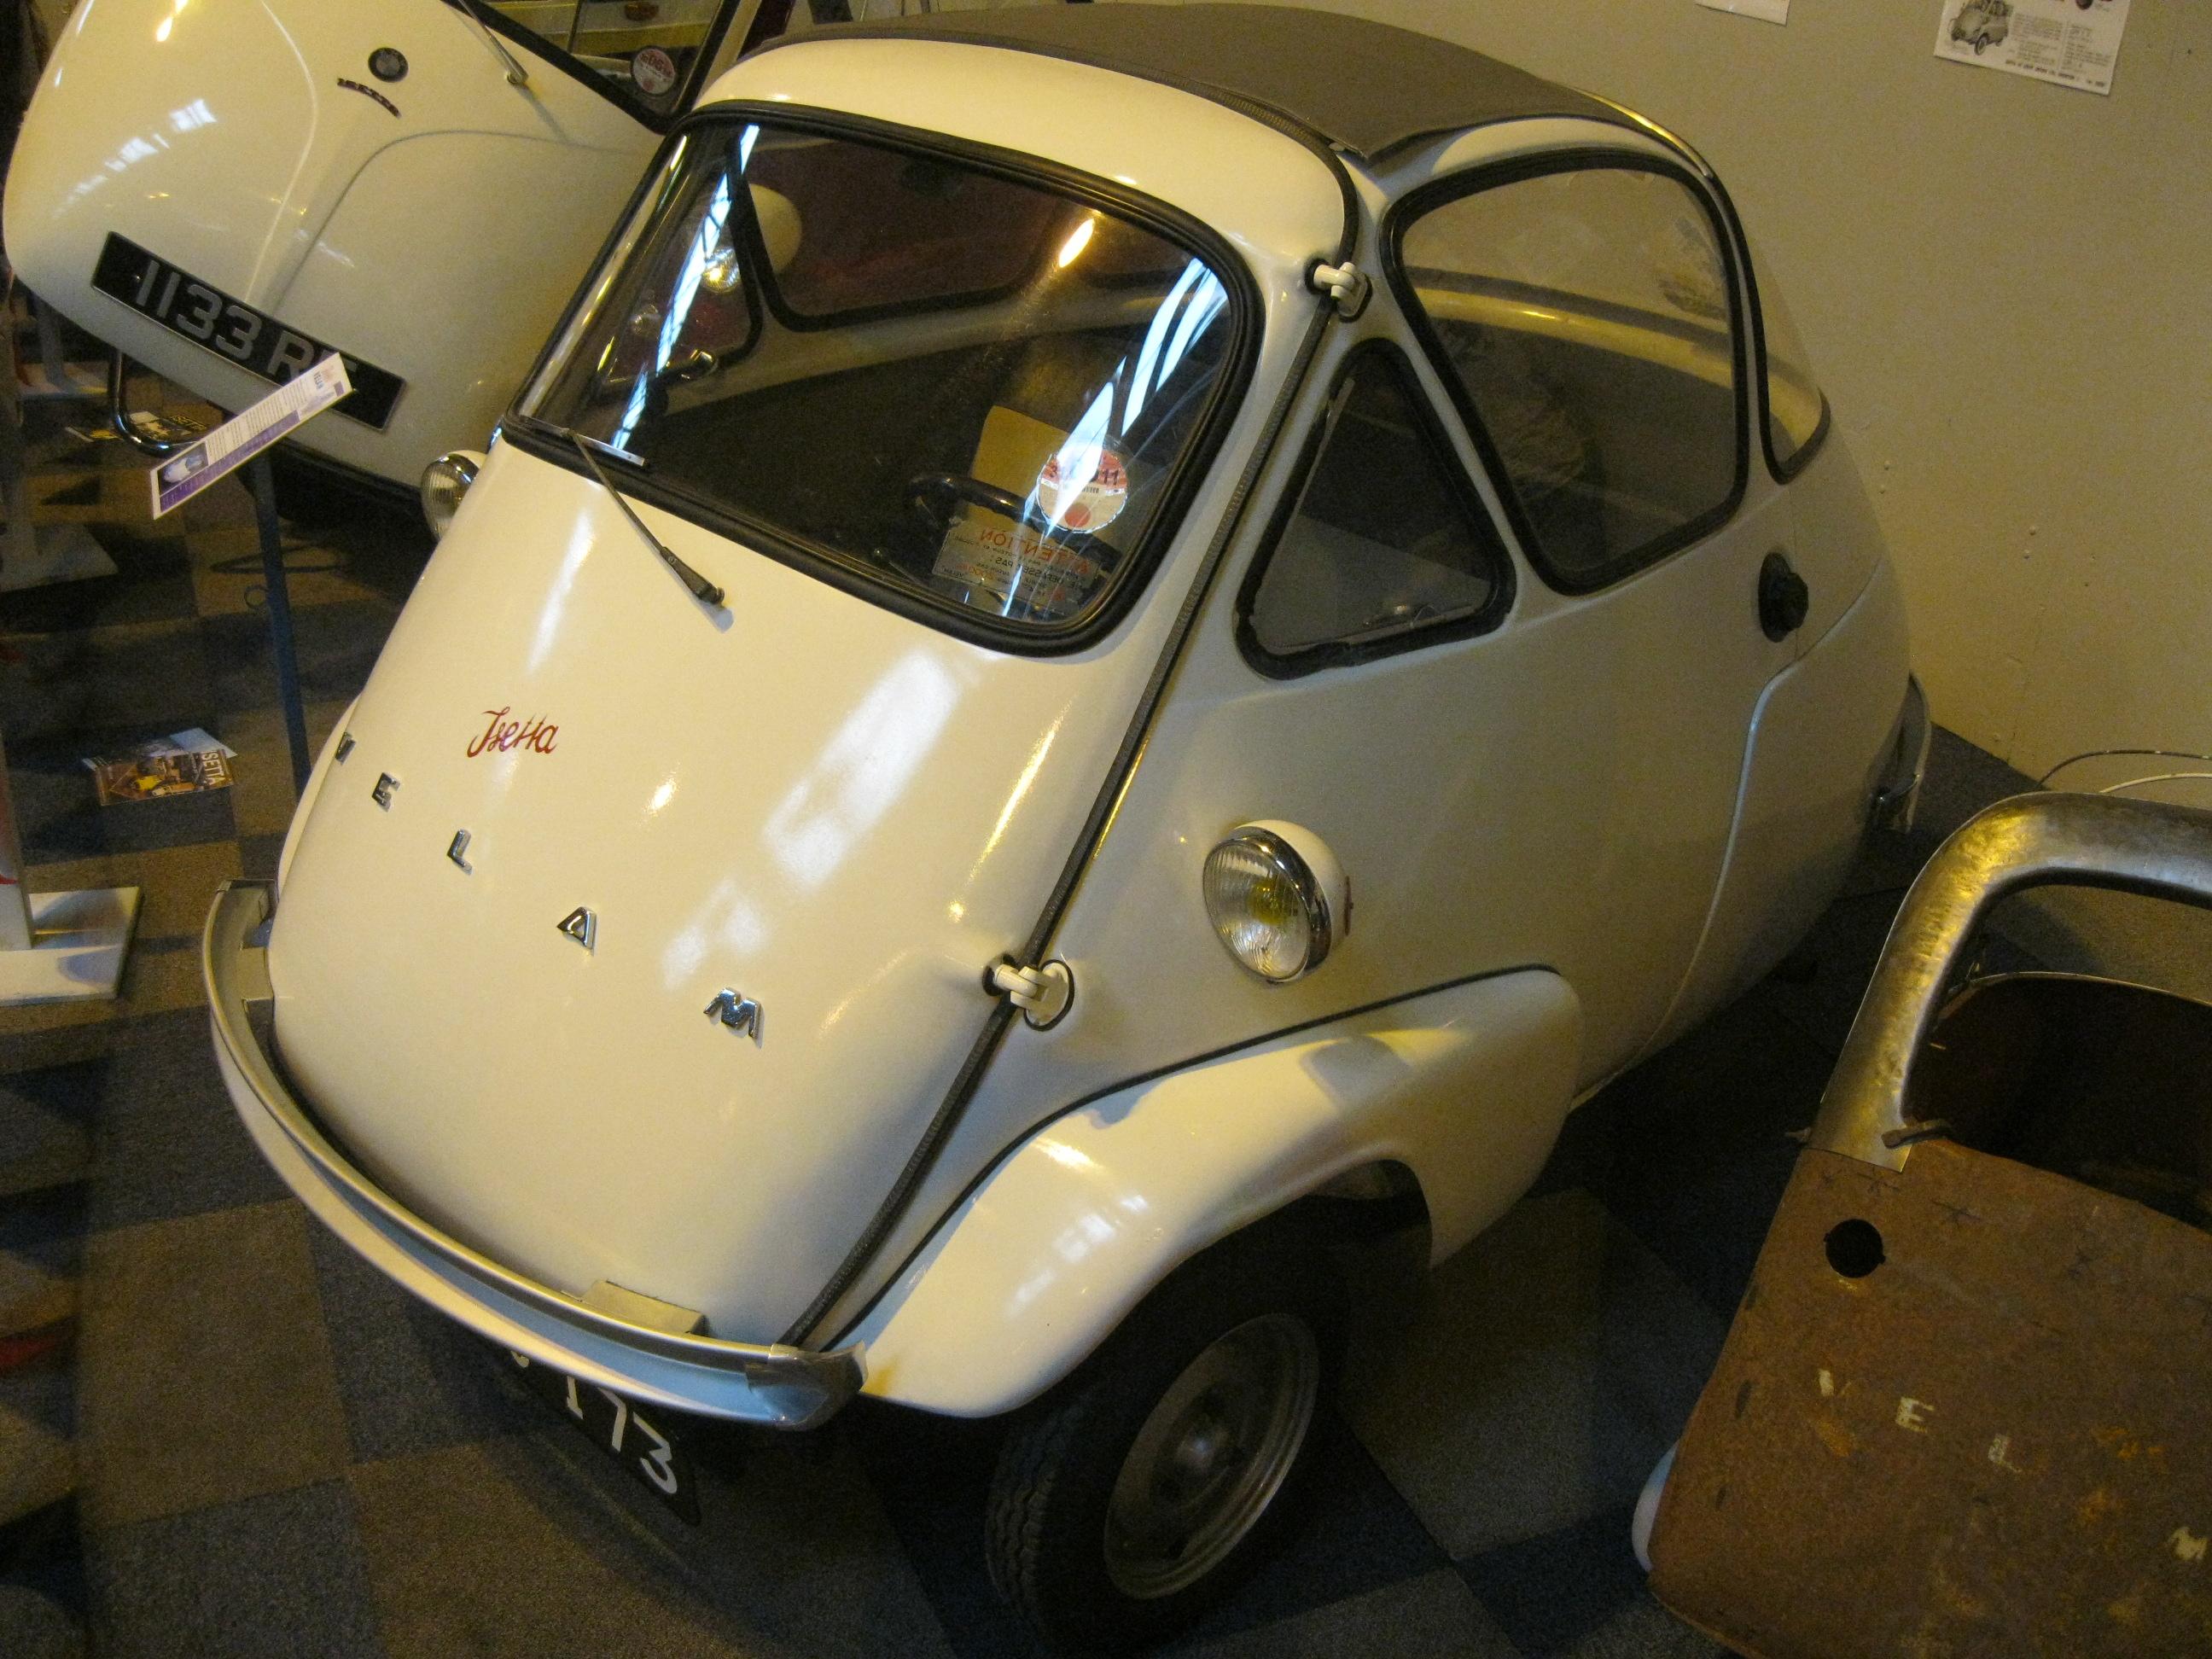 Velam_-Isetta_Bubble_Car_derivative_from_France